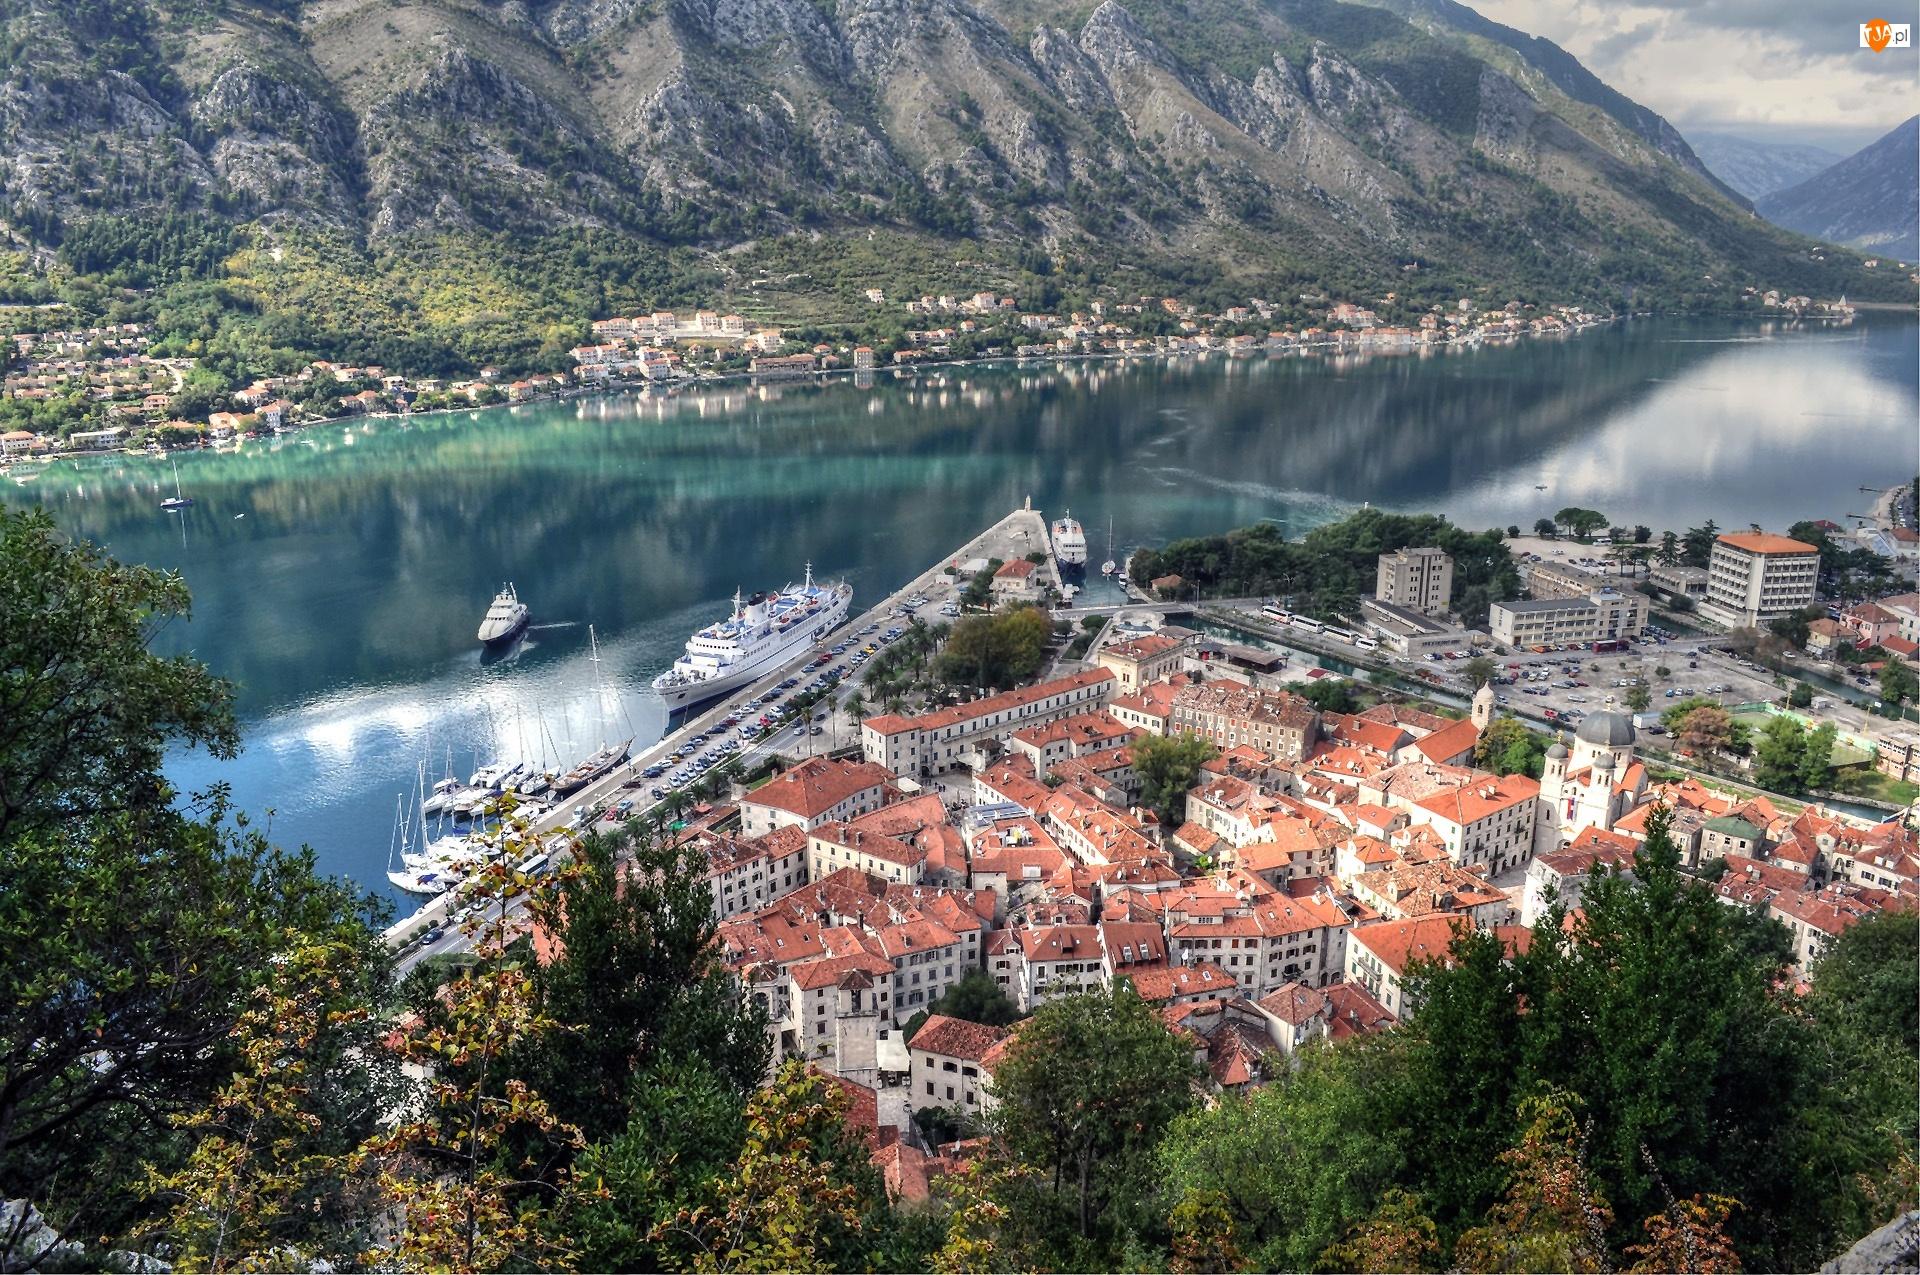 Góry, Statki, Kotor, Czarnogóra, Miasto